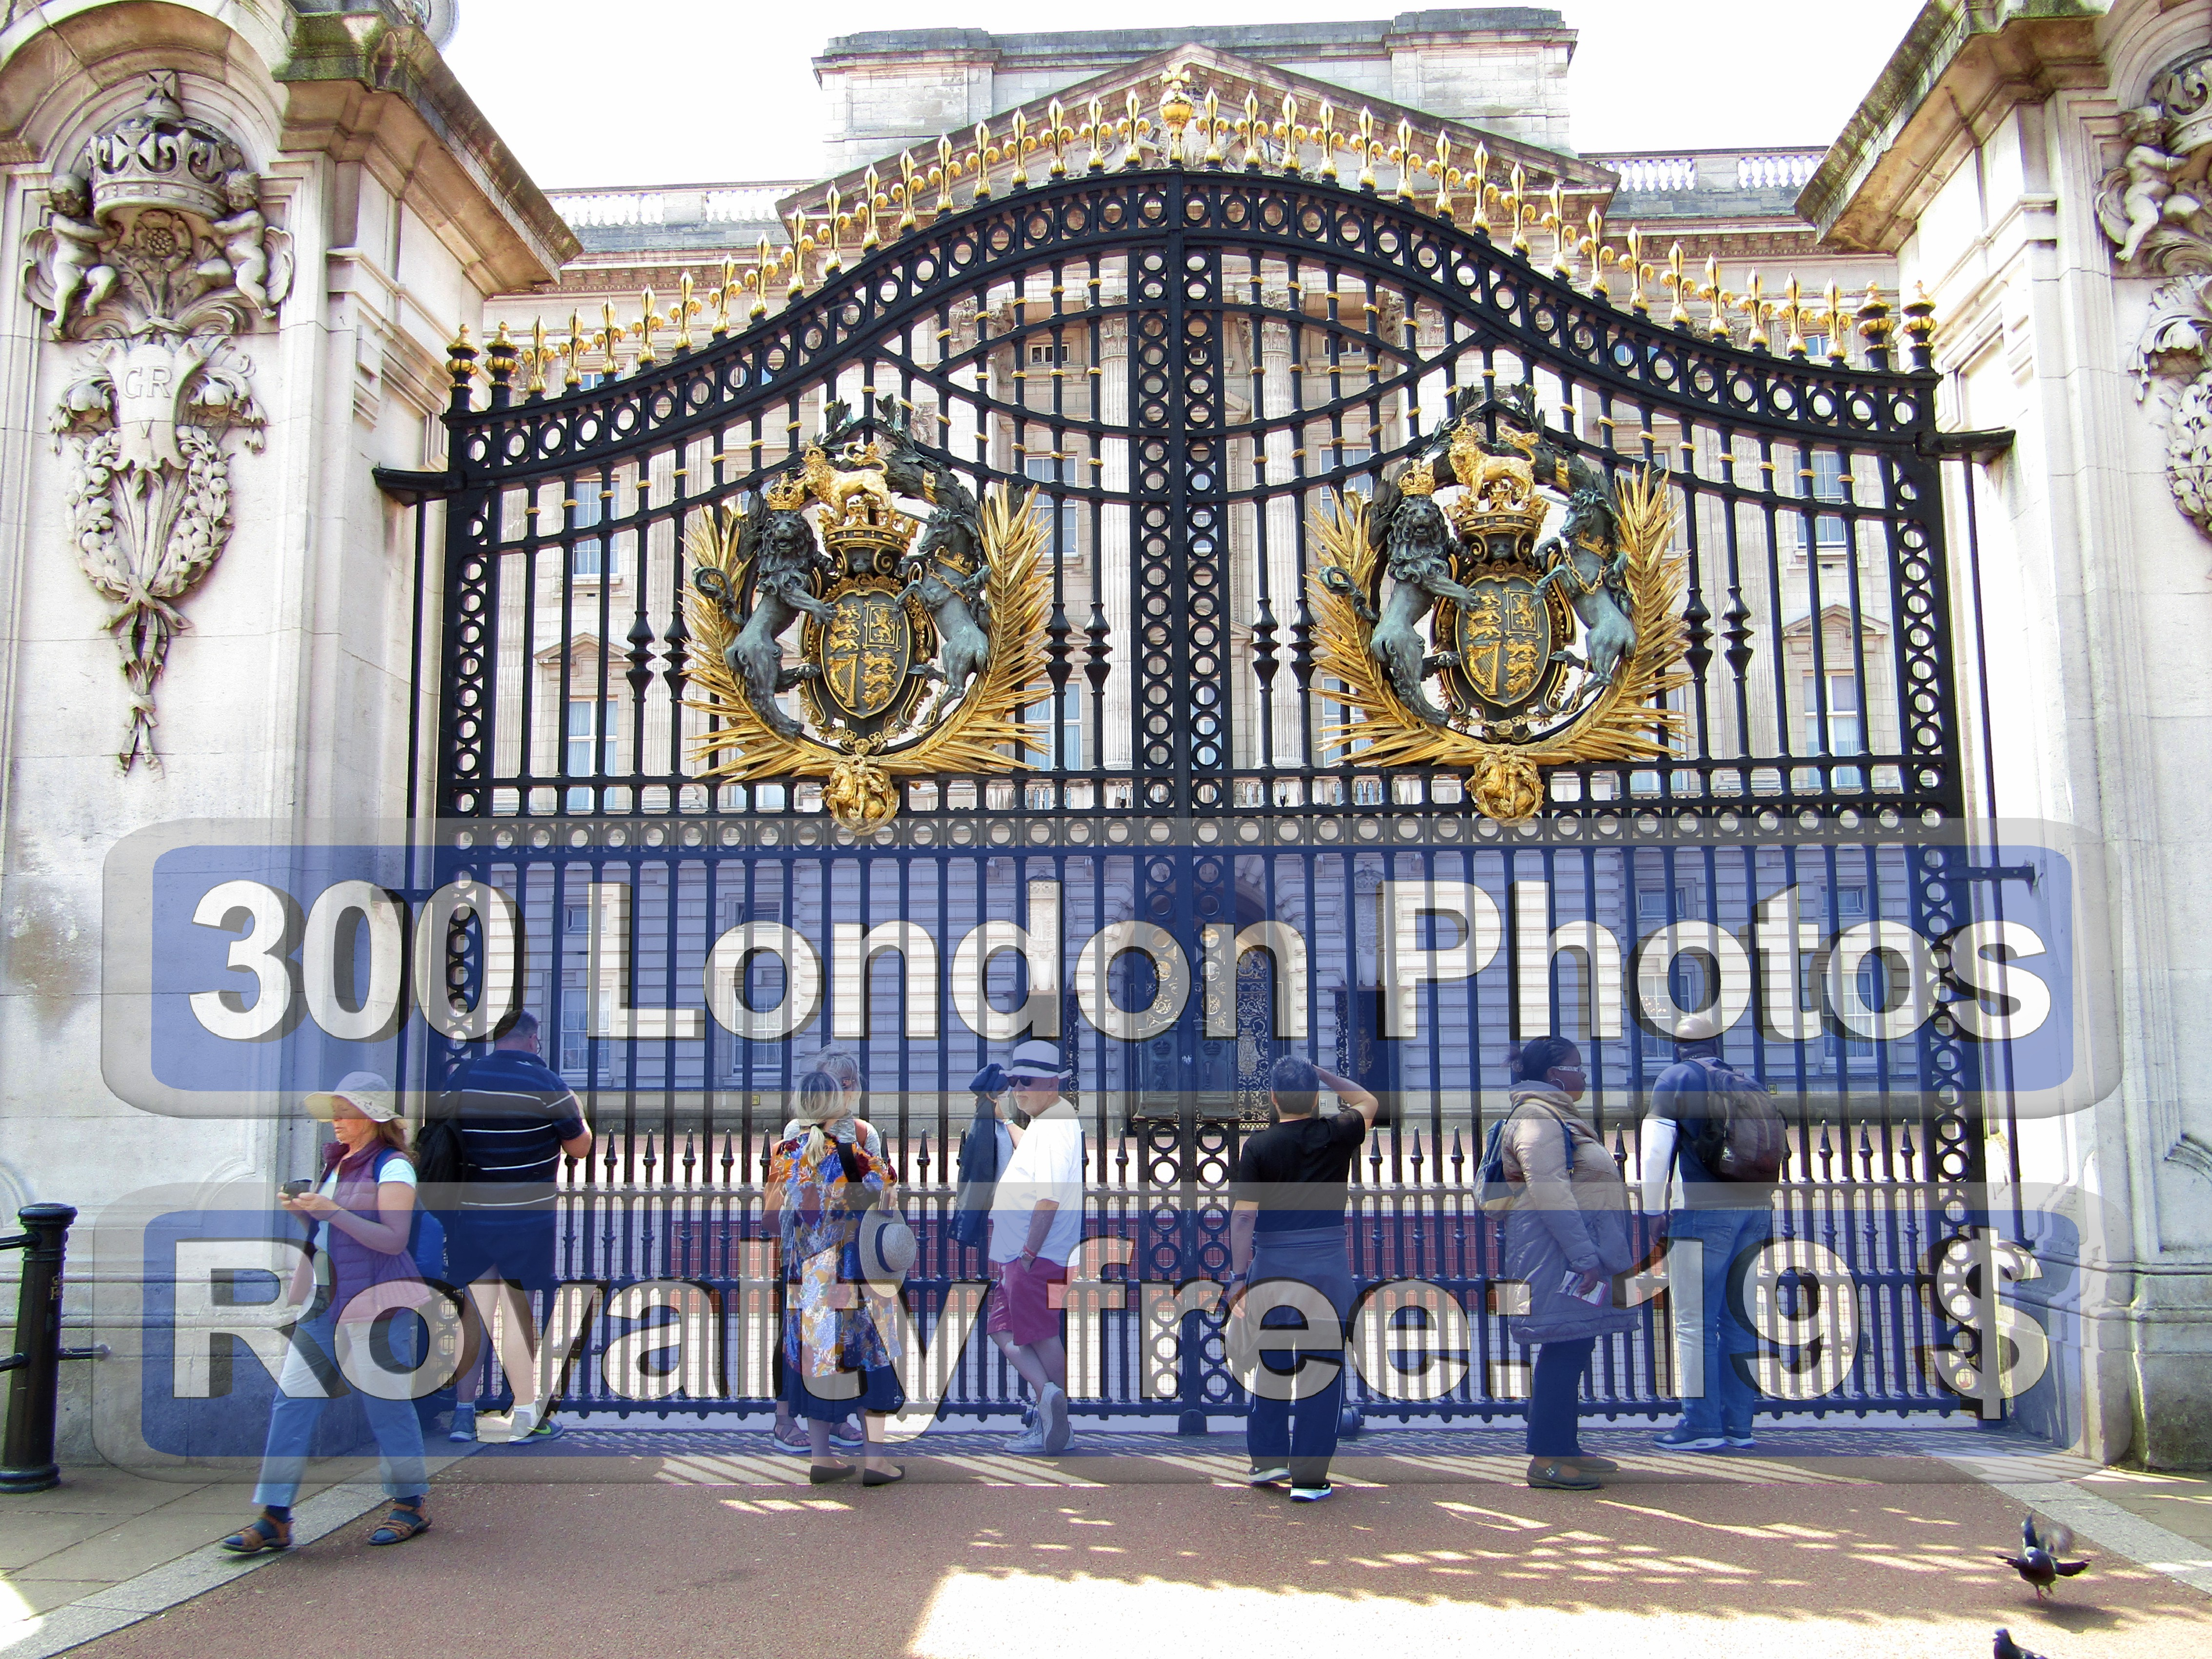 Sweet B Photography London